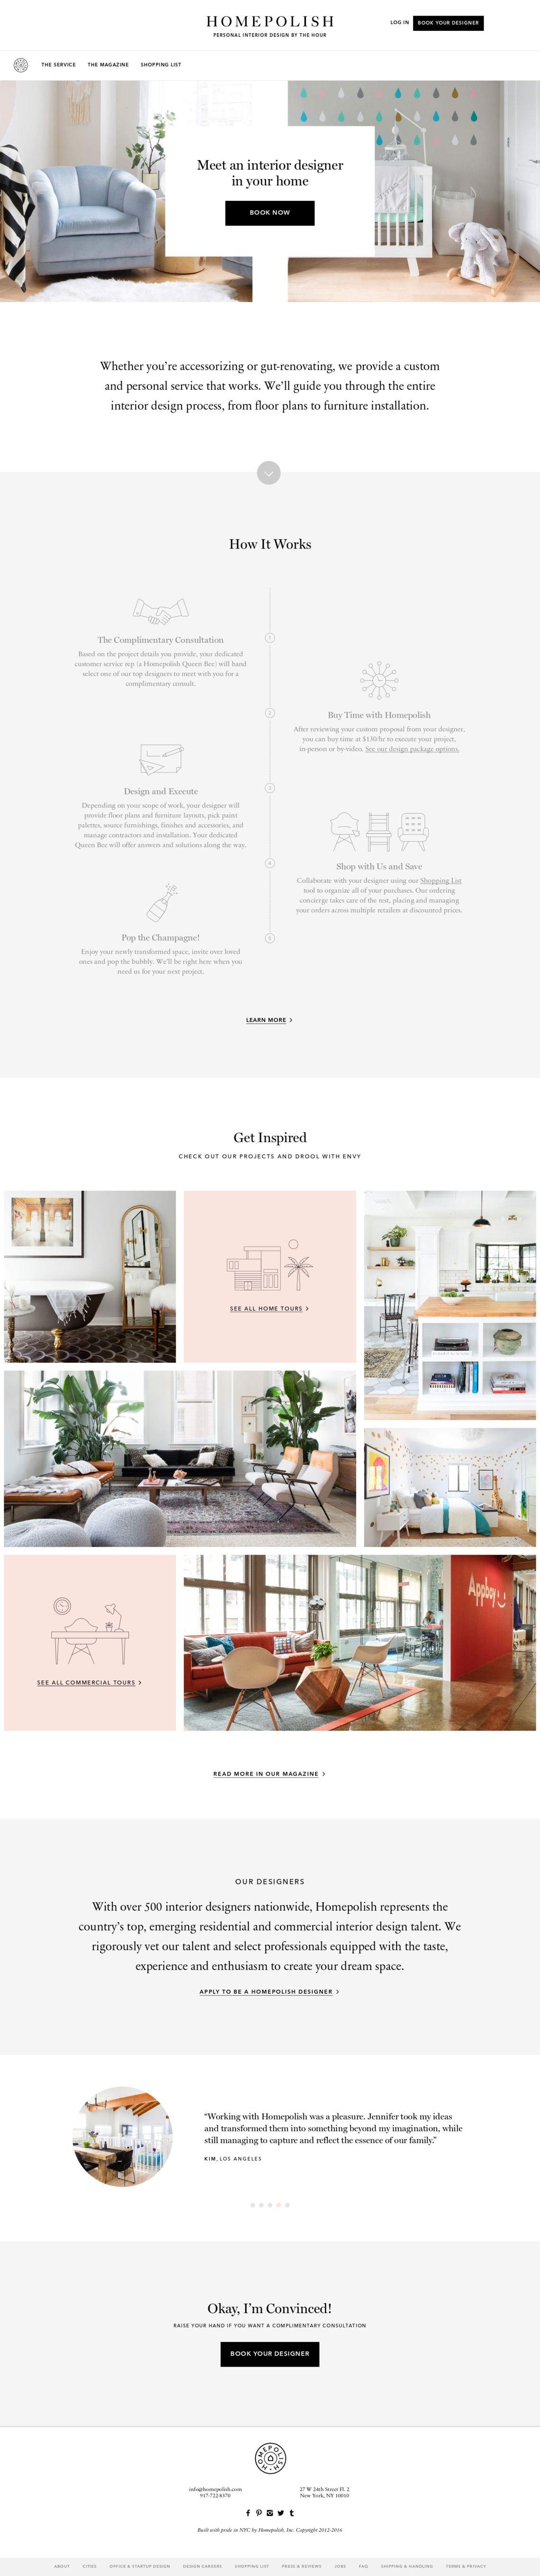 Homepolish Online And In Home Interior Design By The Hour Interior Design Website Portfolio Website Design Design